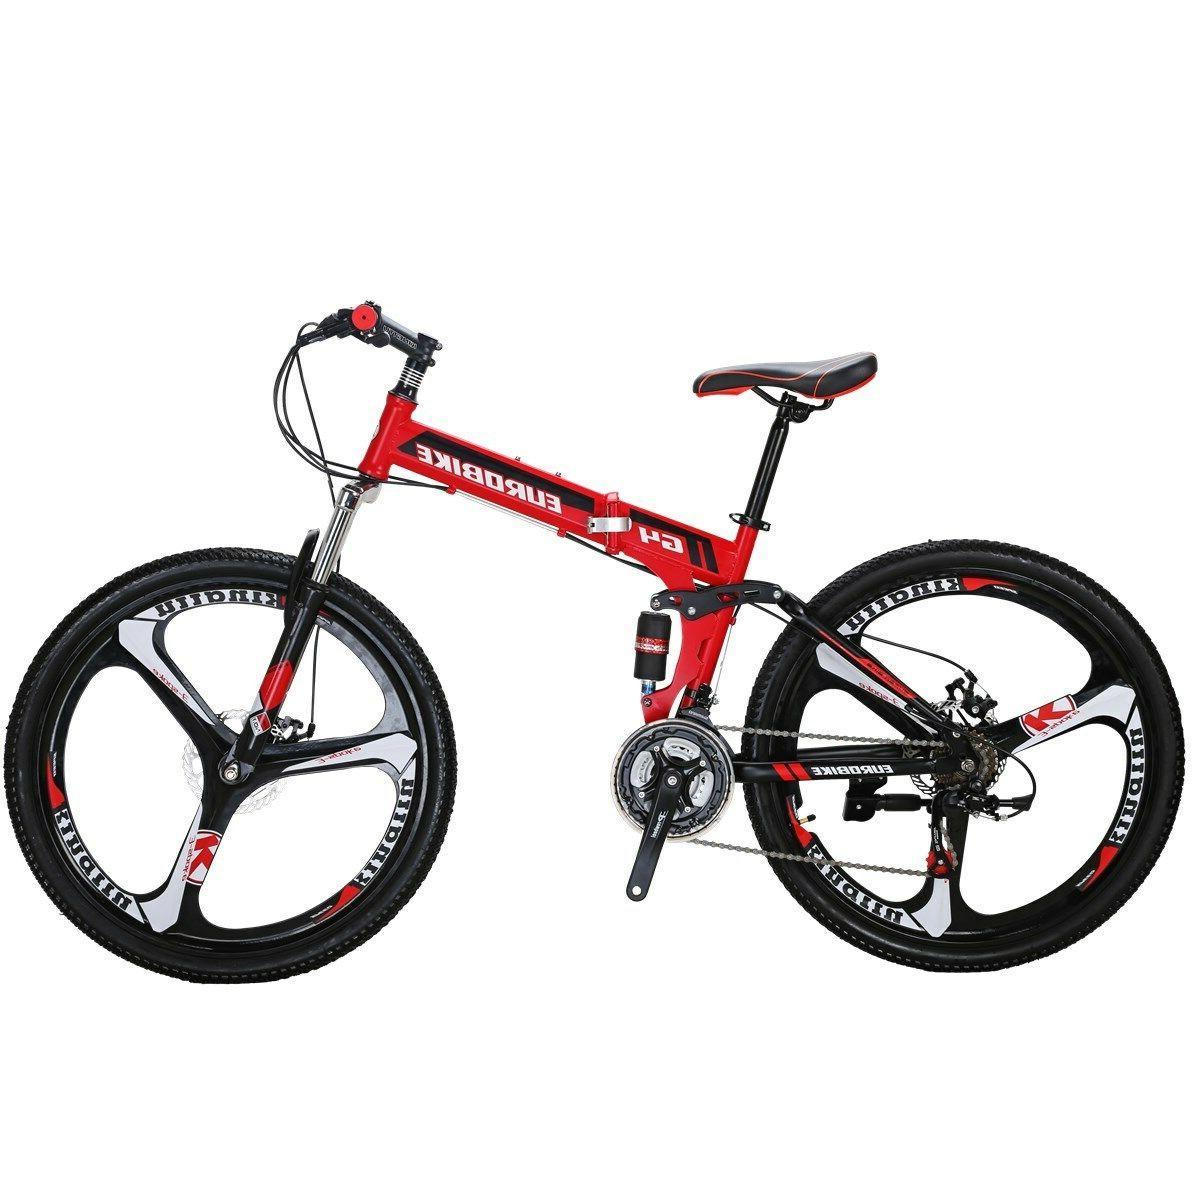 "26"" Folding Mountain Bike 21 Speed Full Suspension Disc Brak"